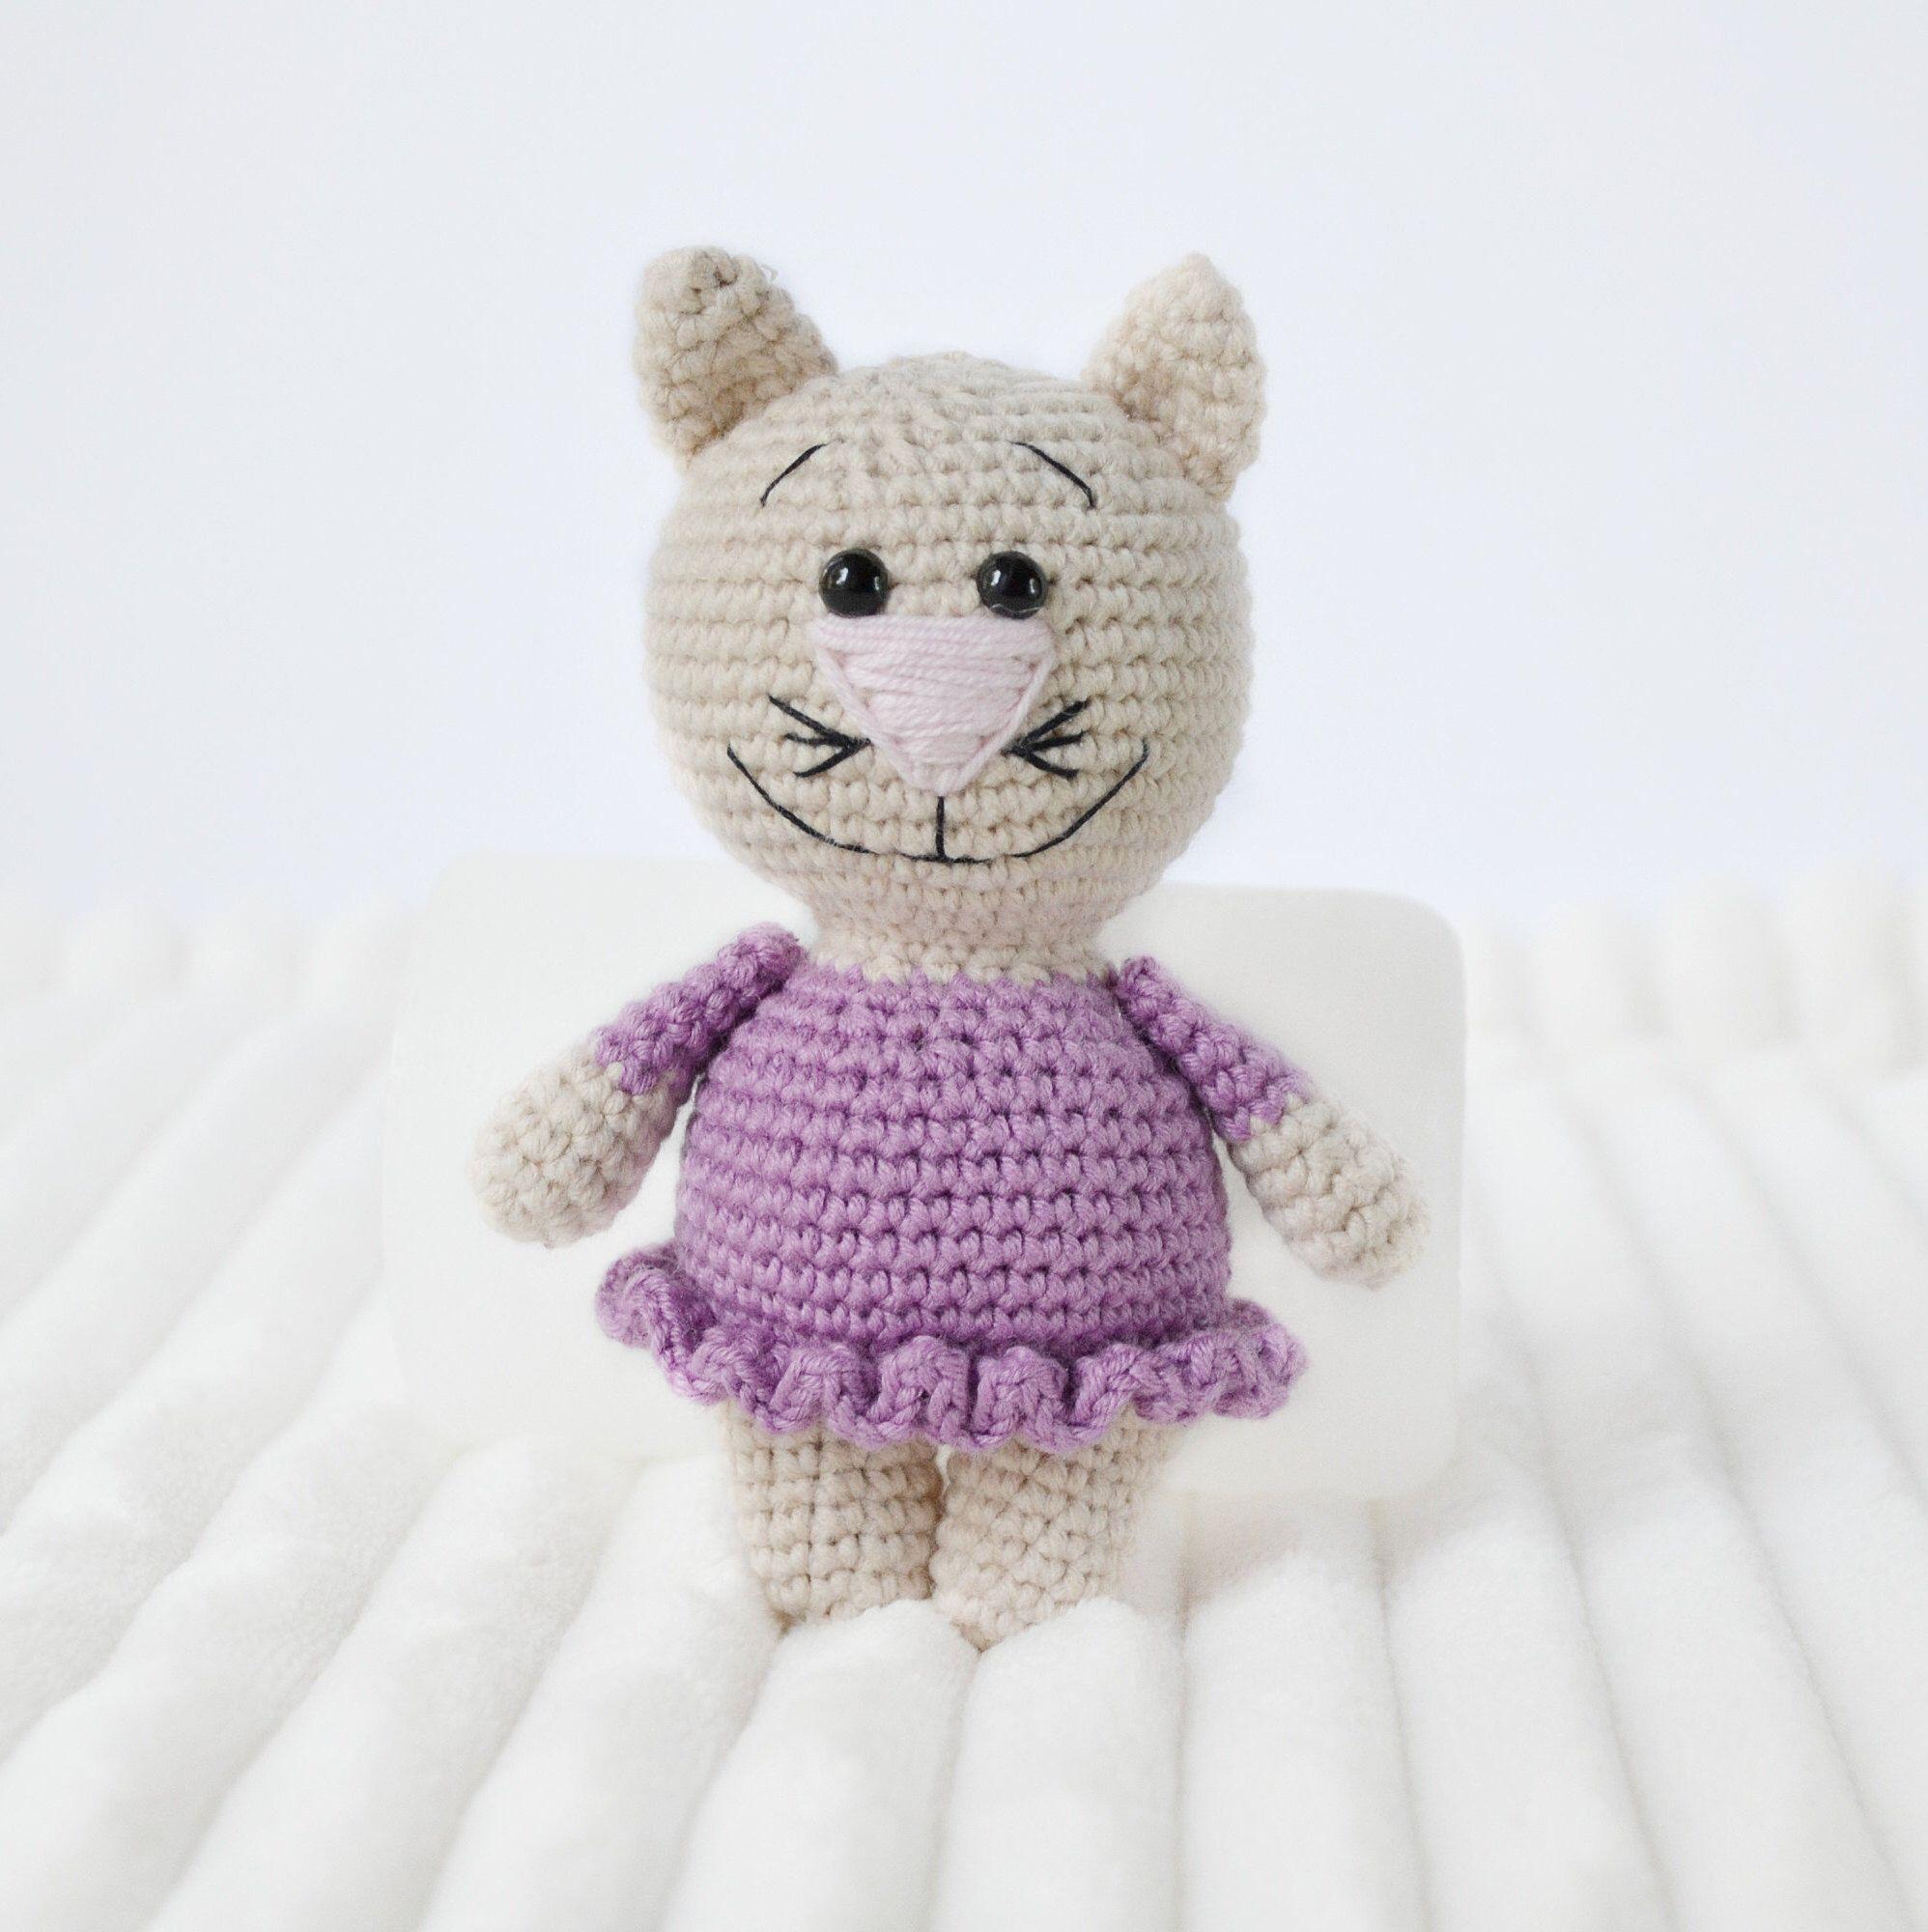 Crochet cat with purple dress Amigurumi Handmade Crochet